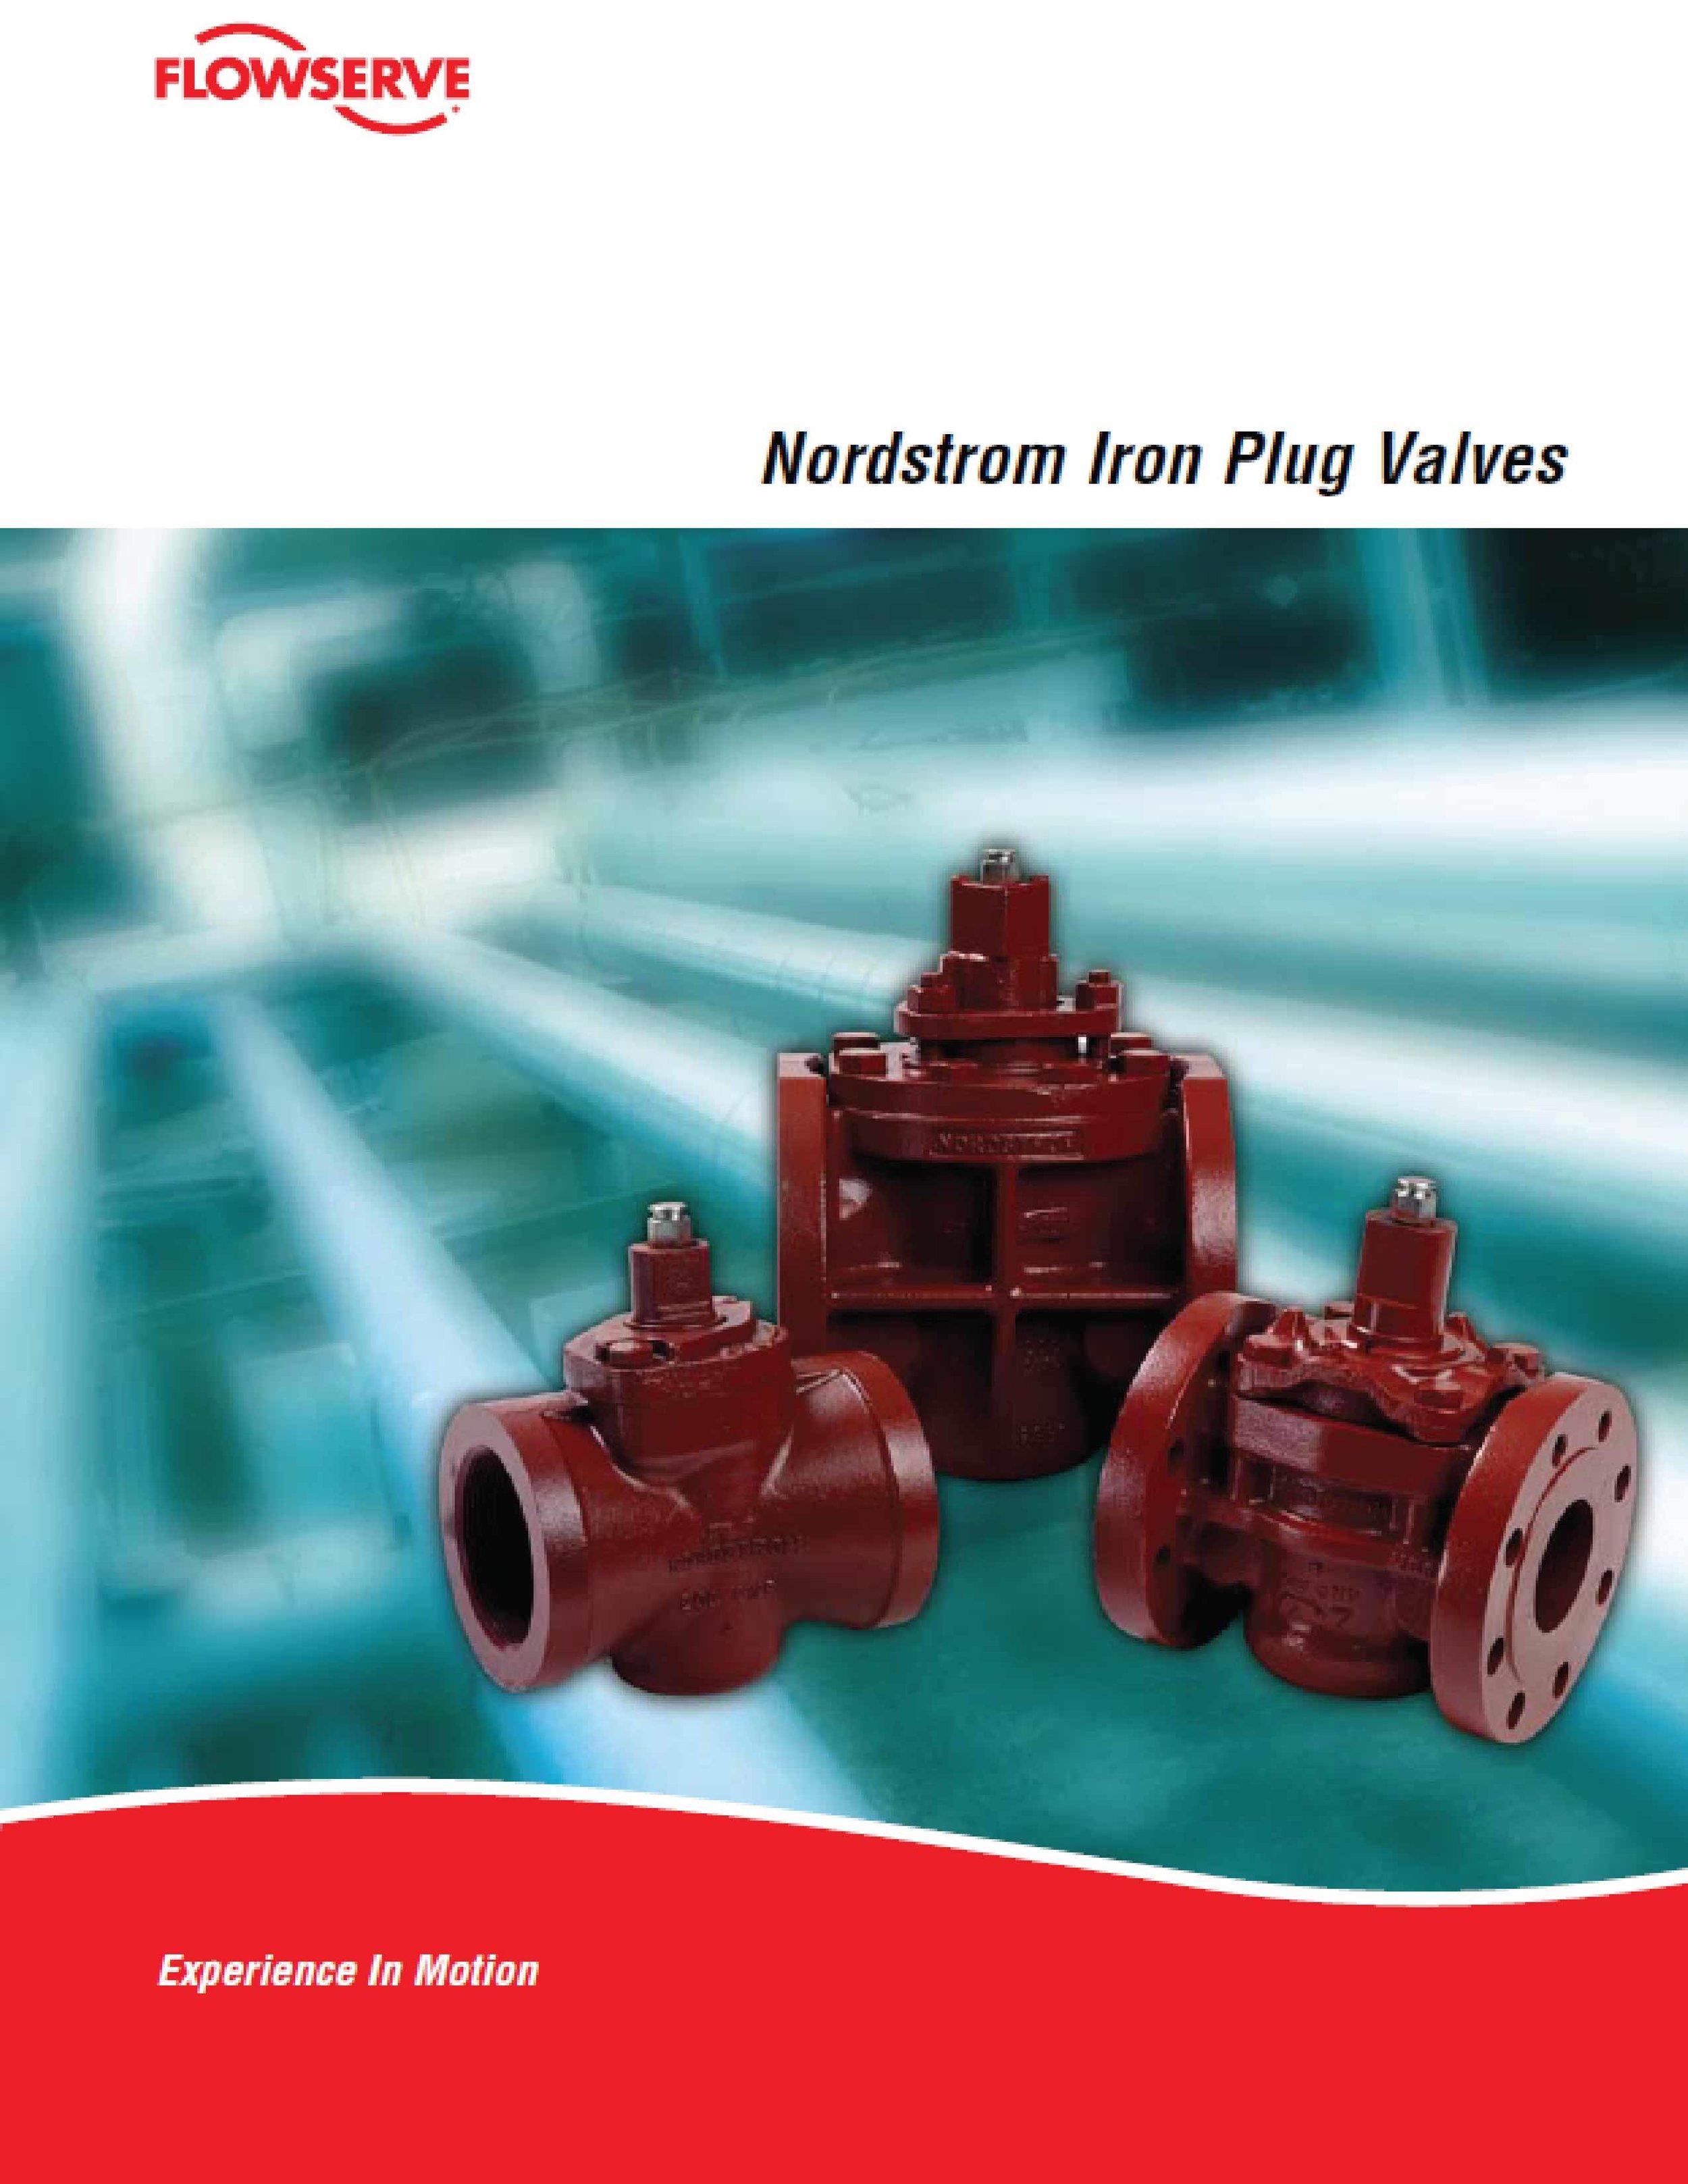 Nordstrom_plug-iron-brochure-01.jpg